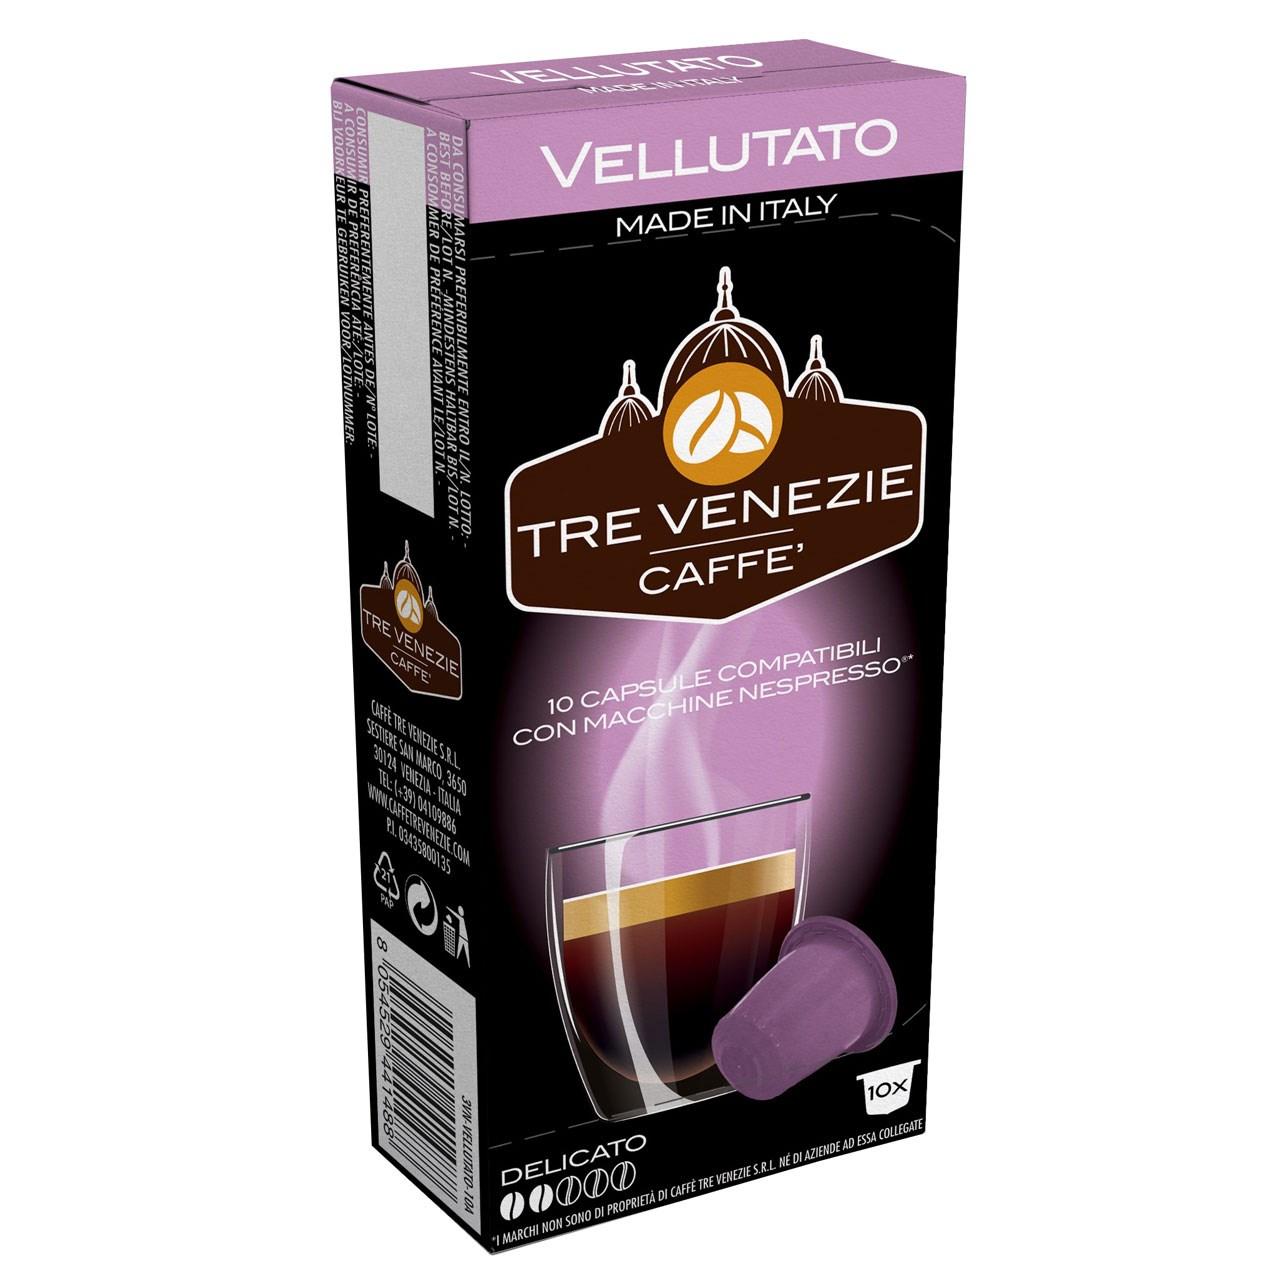 کپسول قهوه تِرِونیز مدل Vellutato بسته 10 عددی